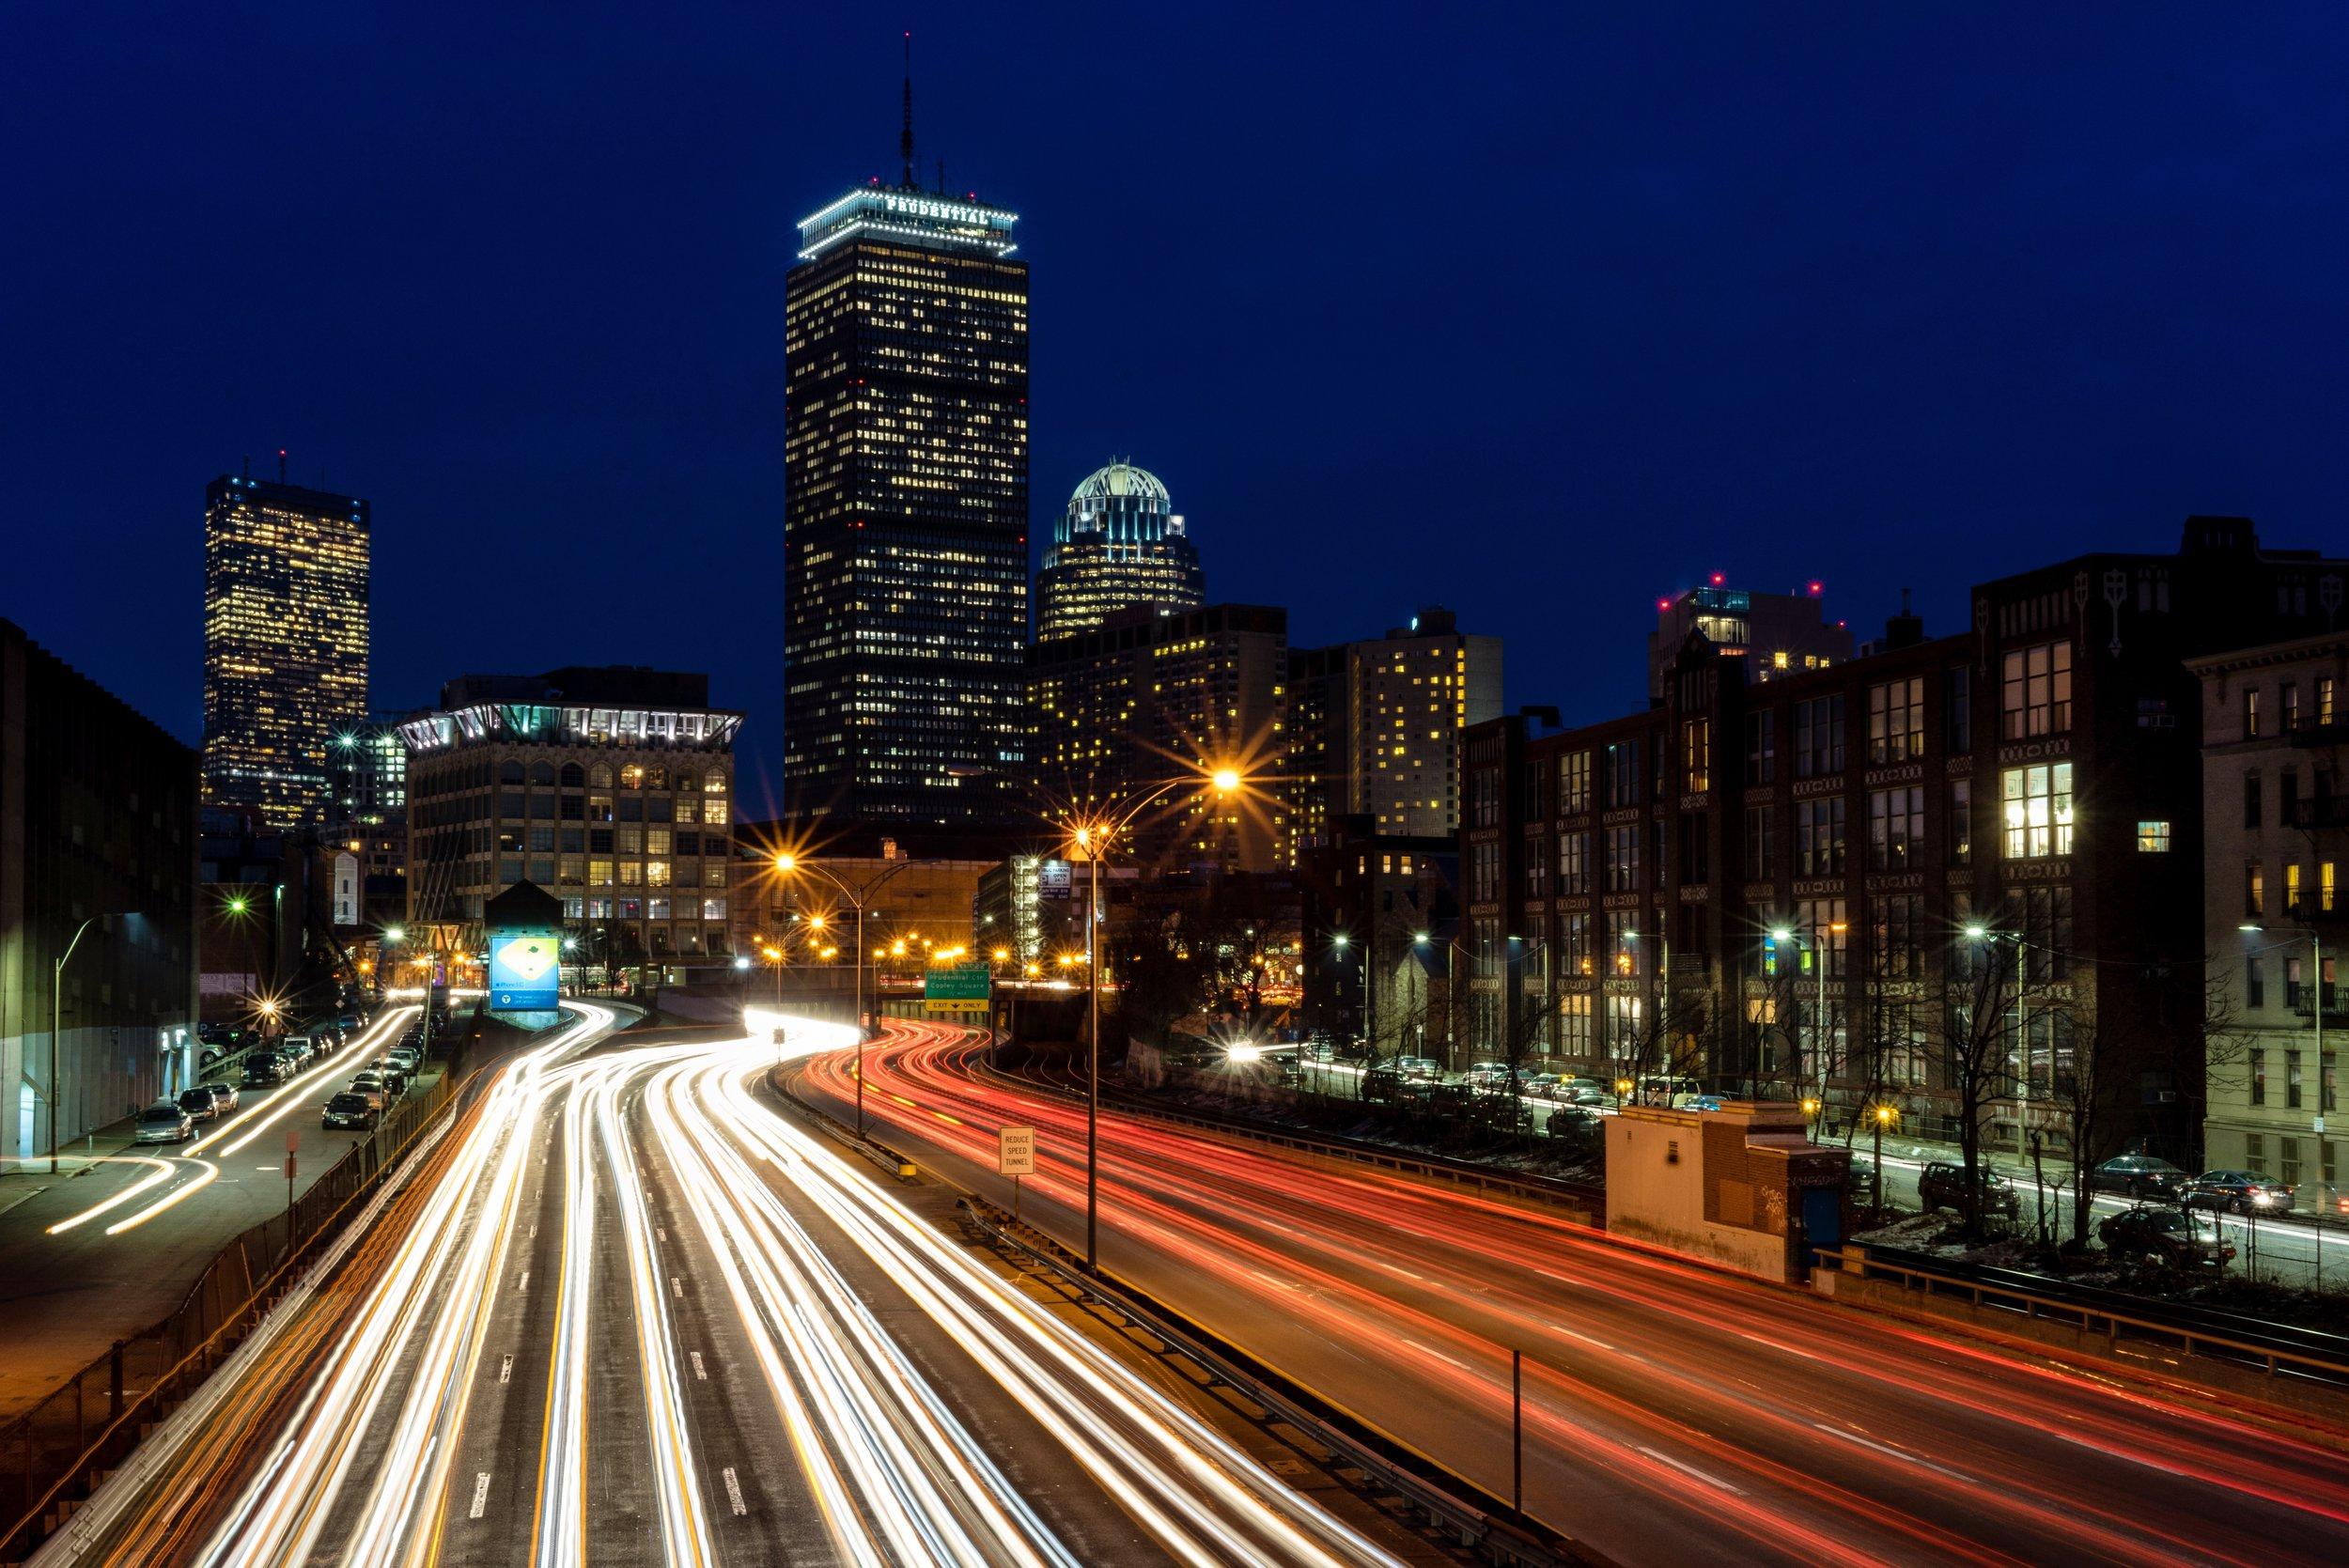 Boston traffic at night. Credit: CC-licensed  Flikr image  by Robbie Shade